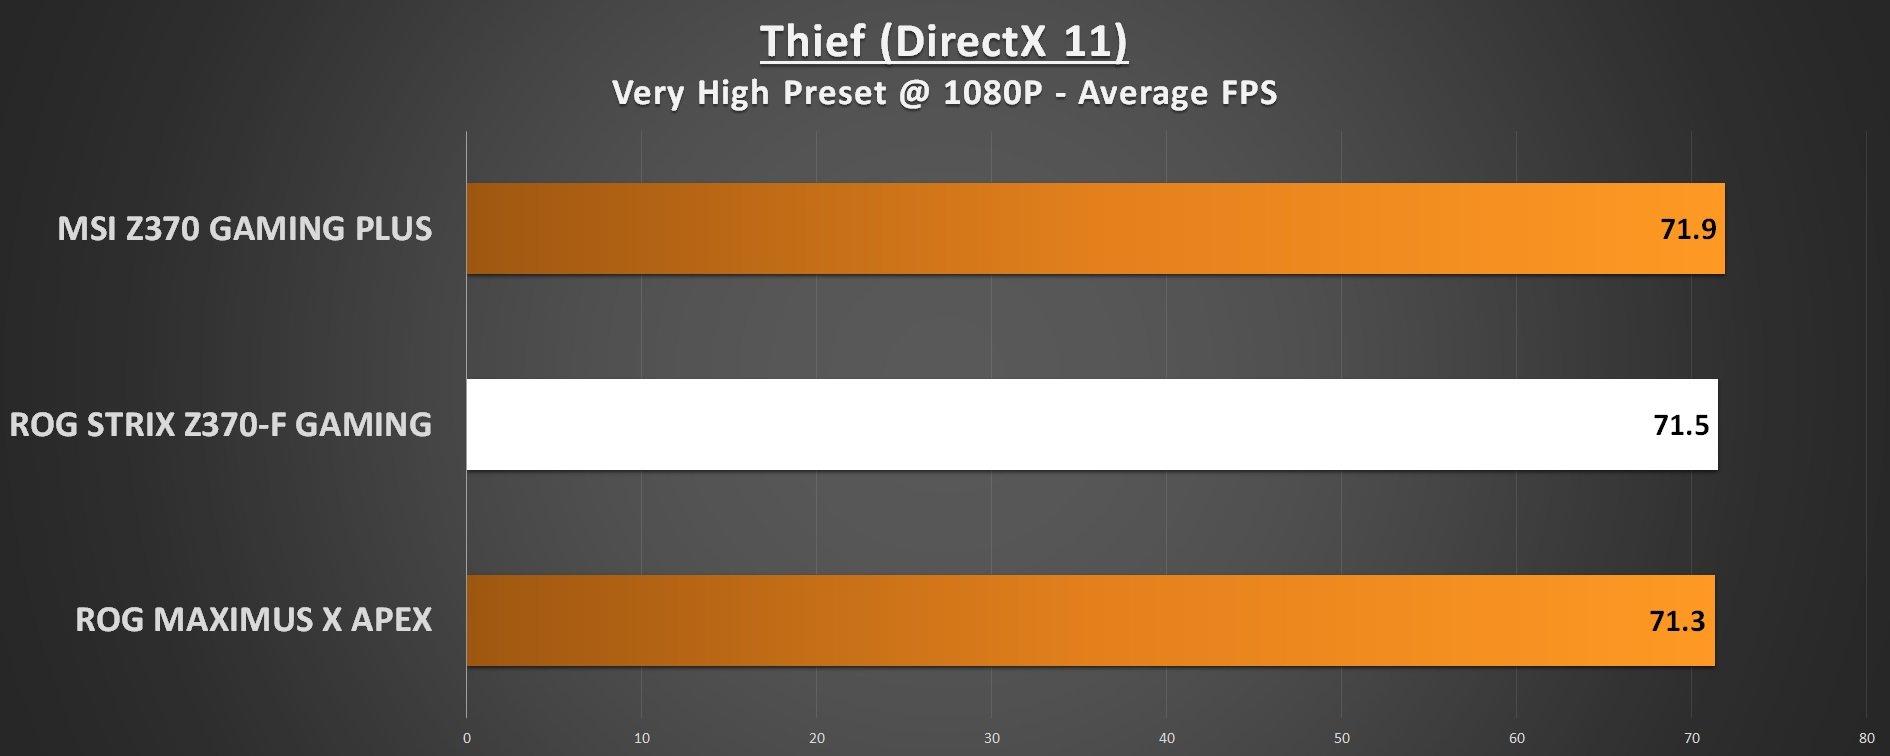 ROG STRIX Z370-F Gaming Thief